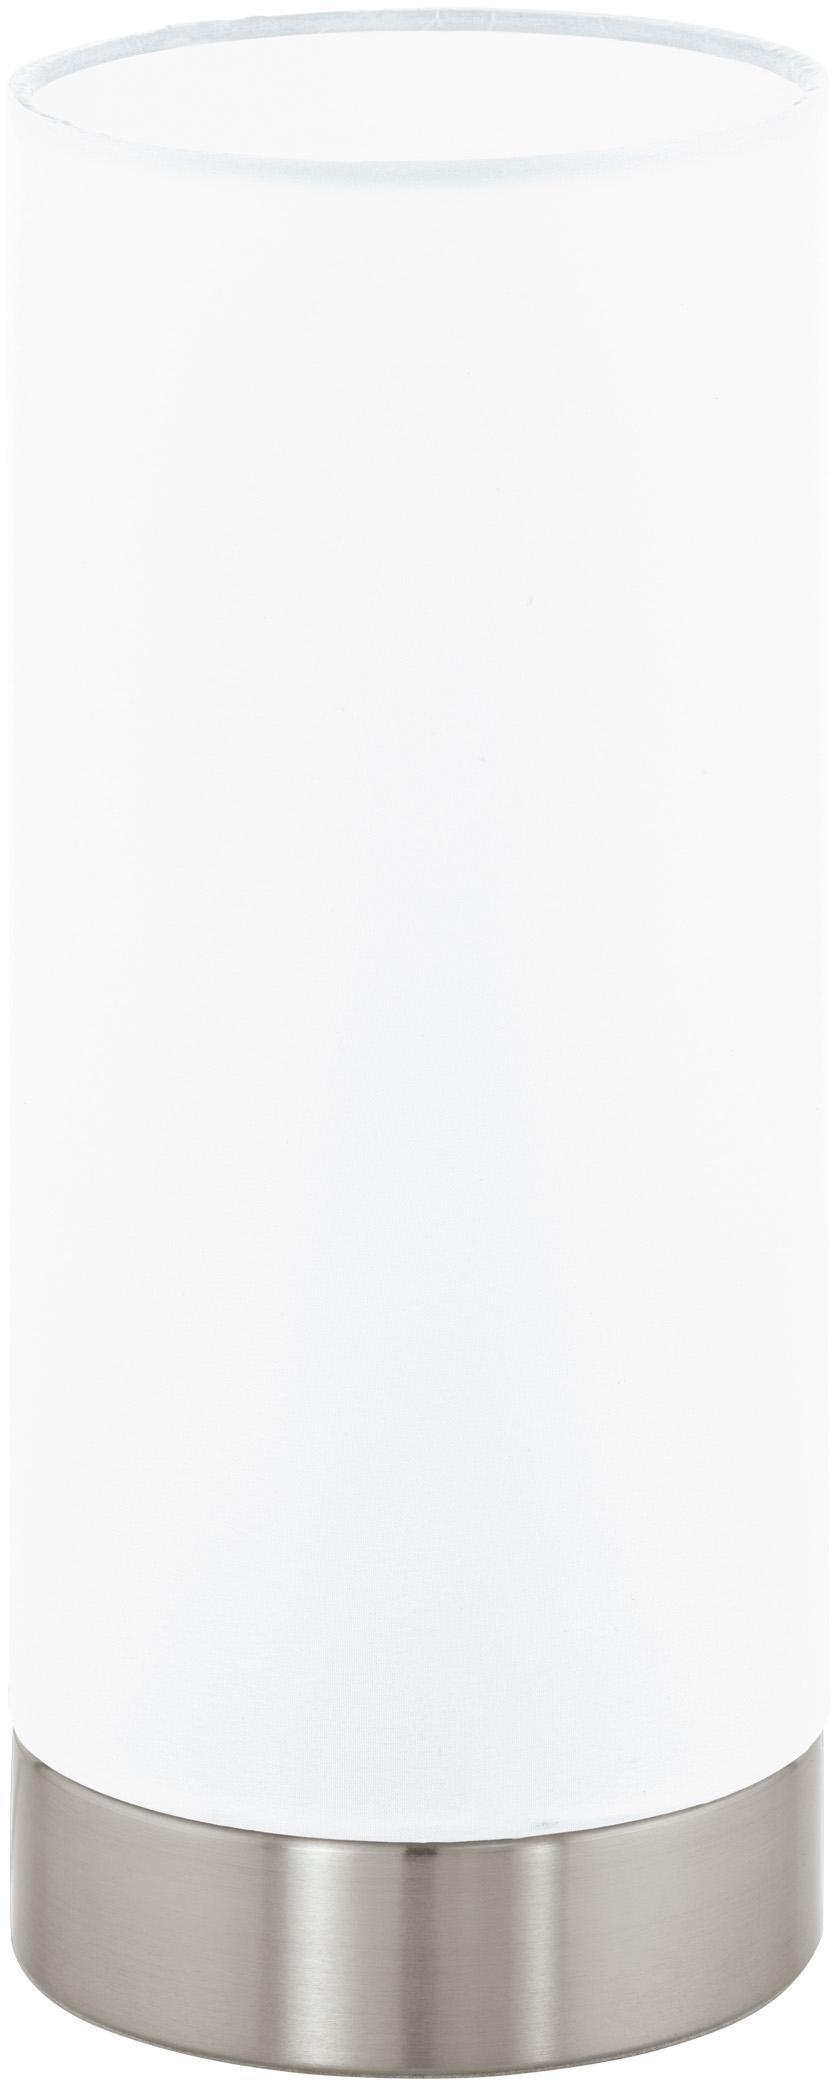 Dimmbare Tischlampe Pasteri, Lampenschirm: Polyester, Weiss, Nickel, Ø 12 x H 26 cm